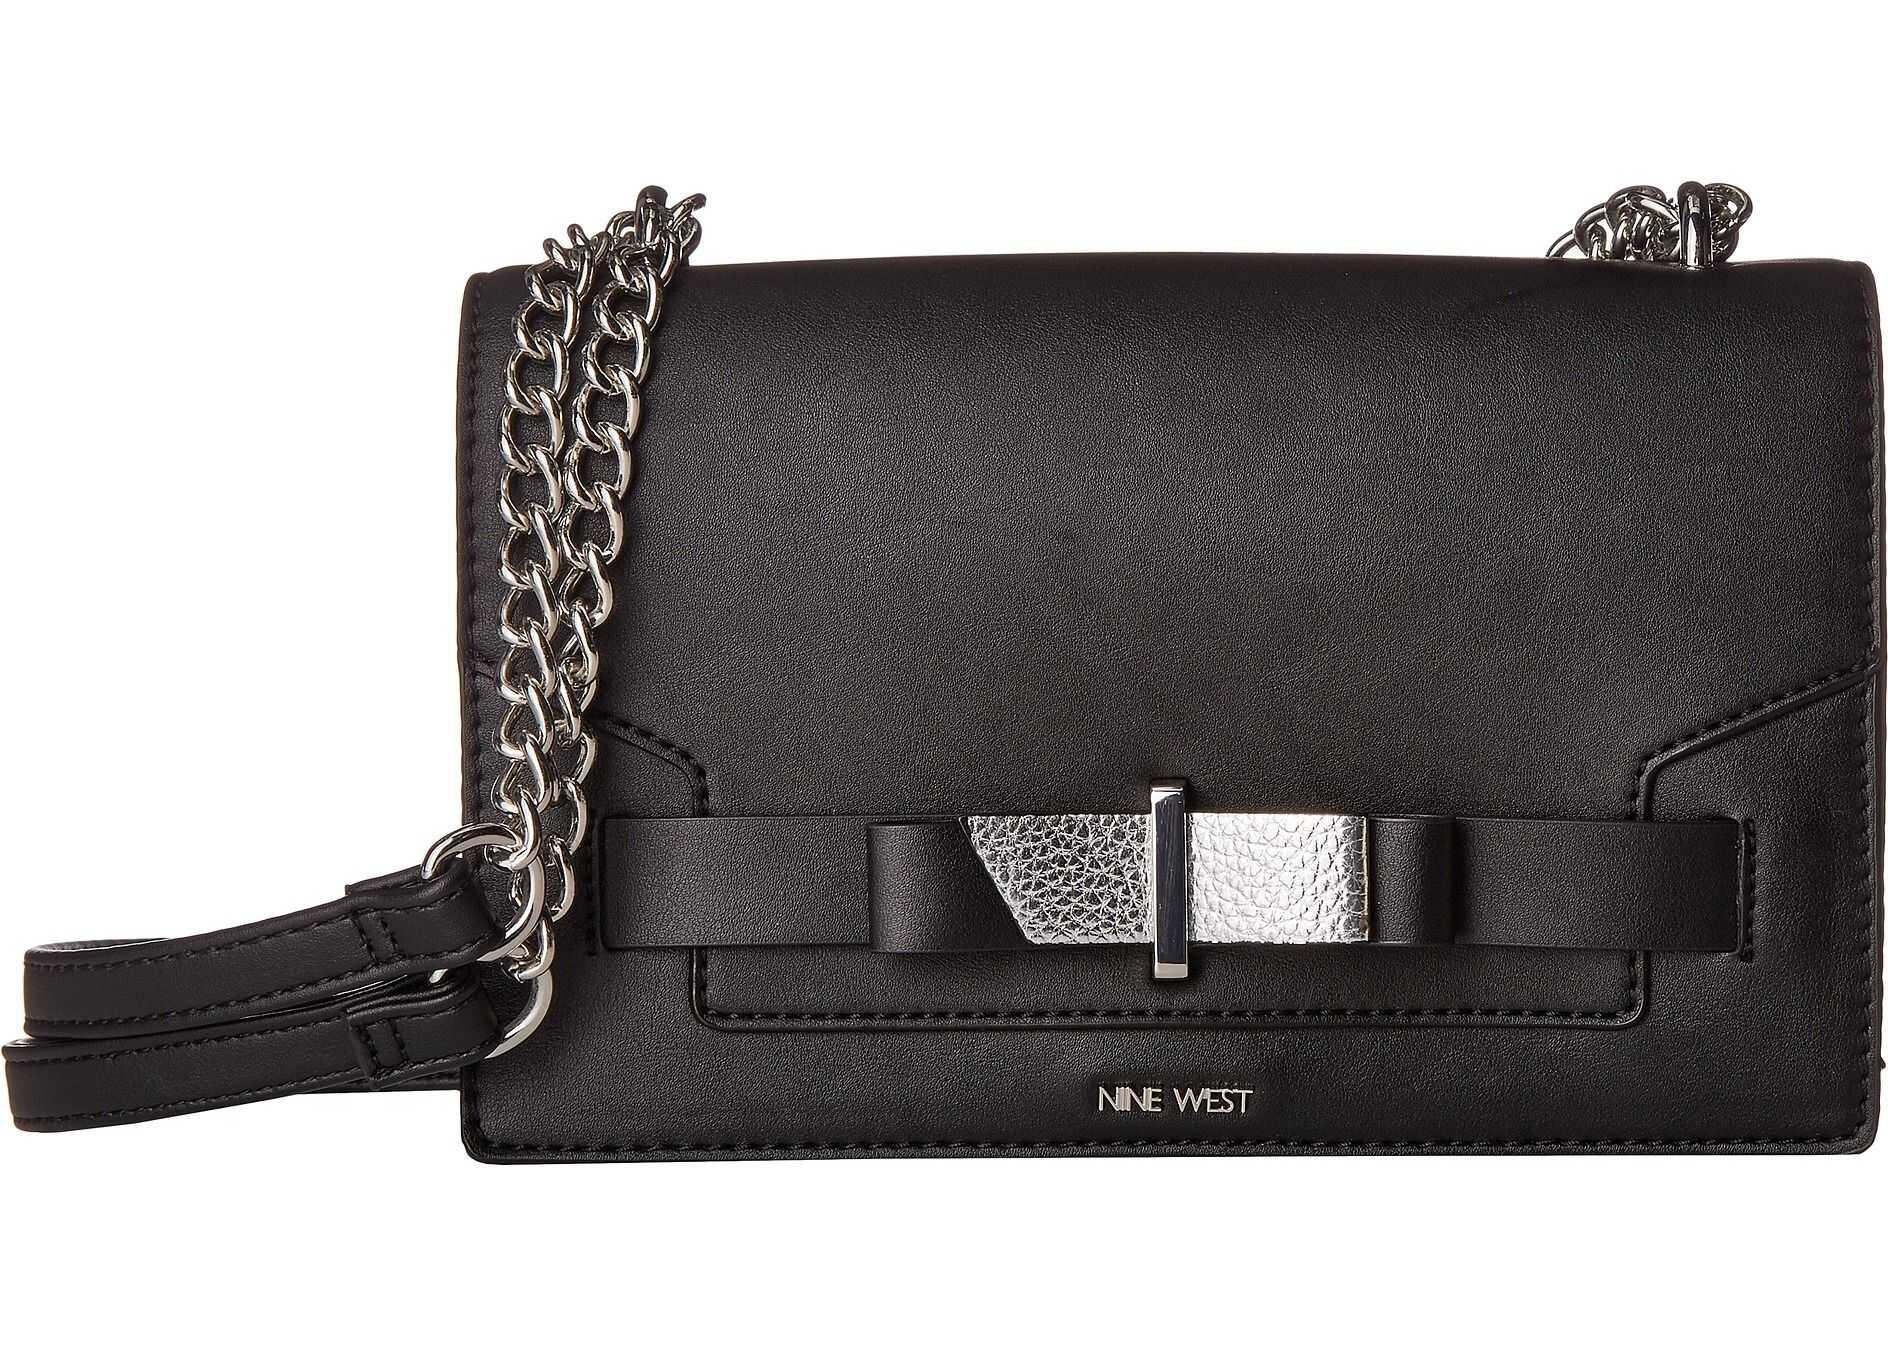 Nine West Paisley Convertible Shoulder Bag Black Multi